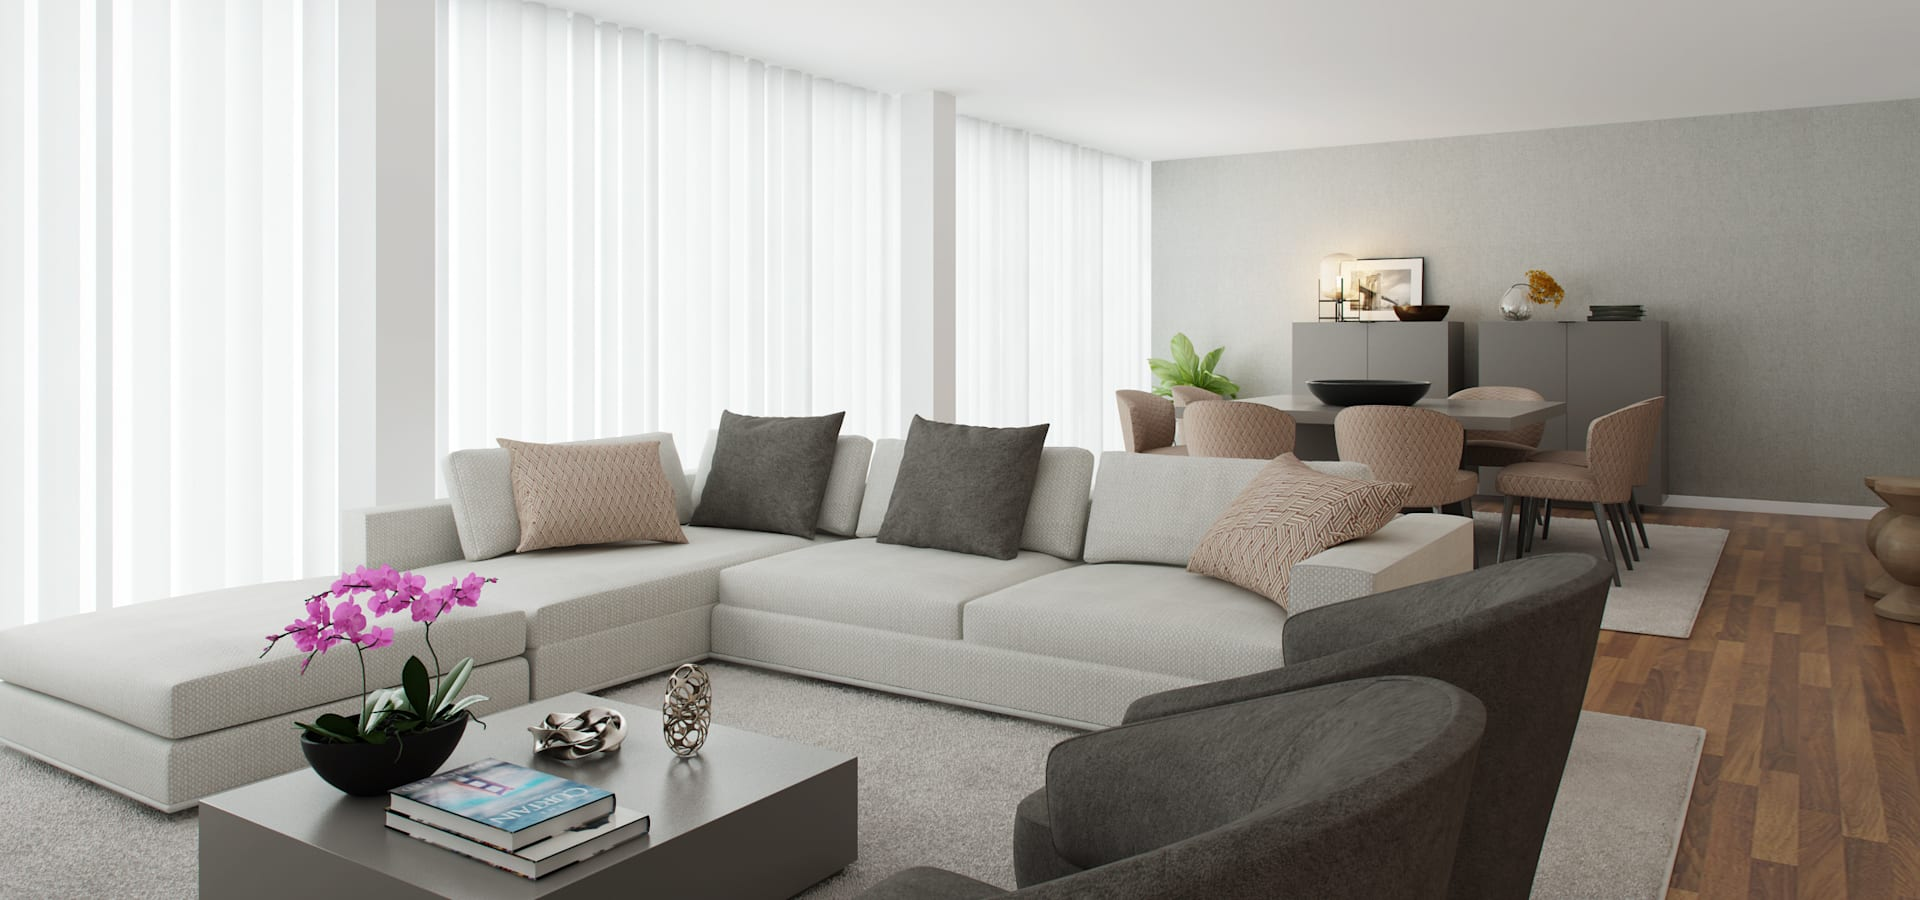 411 – Design e Arquitectura de Interiores